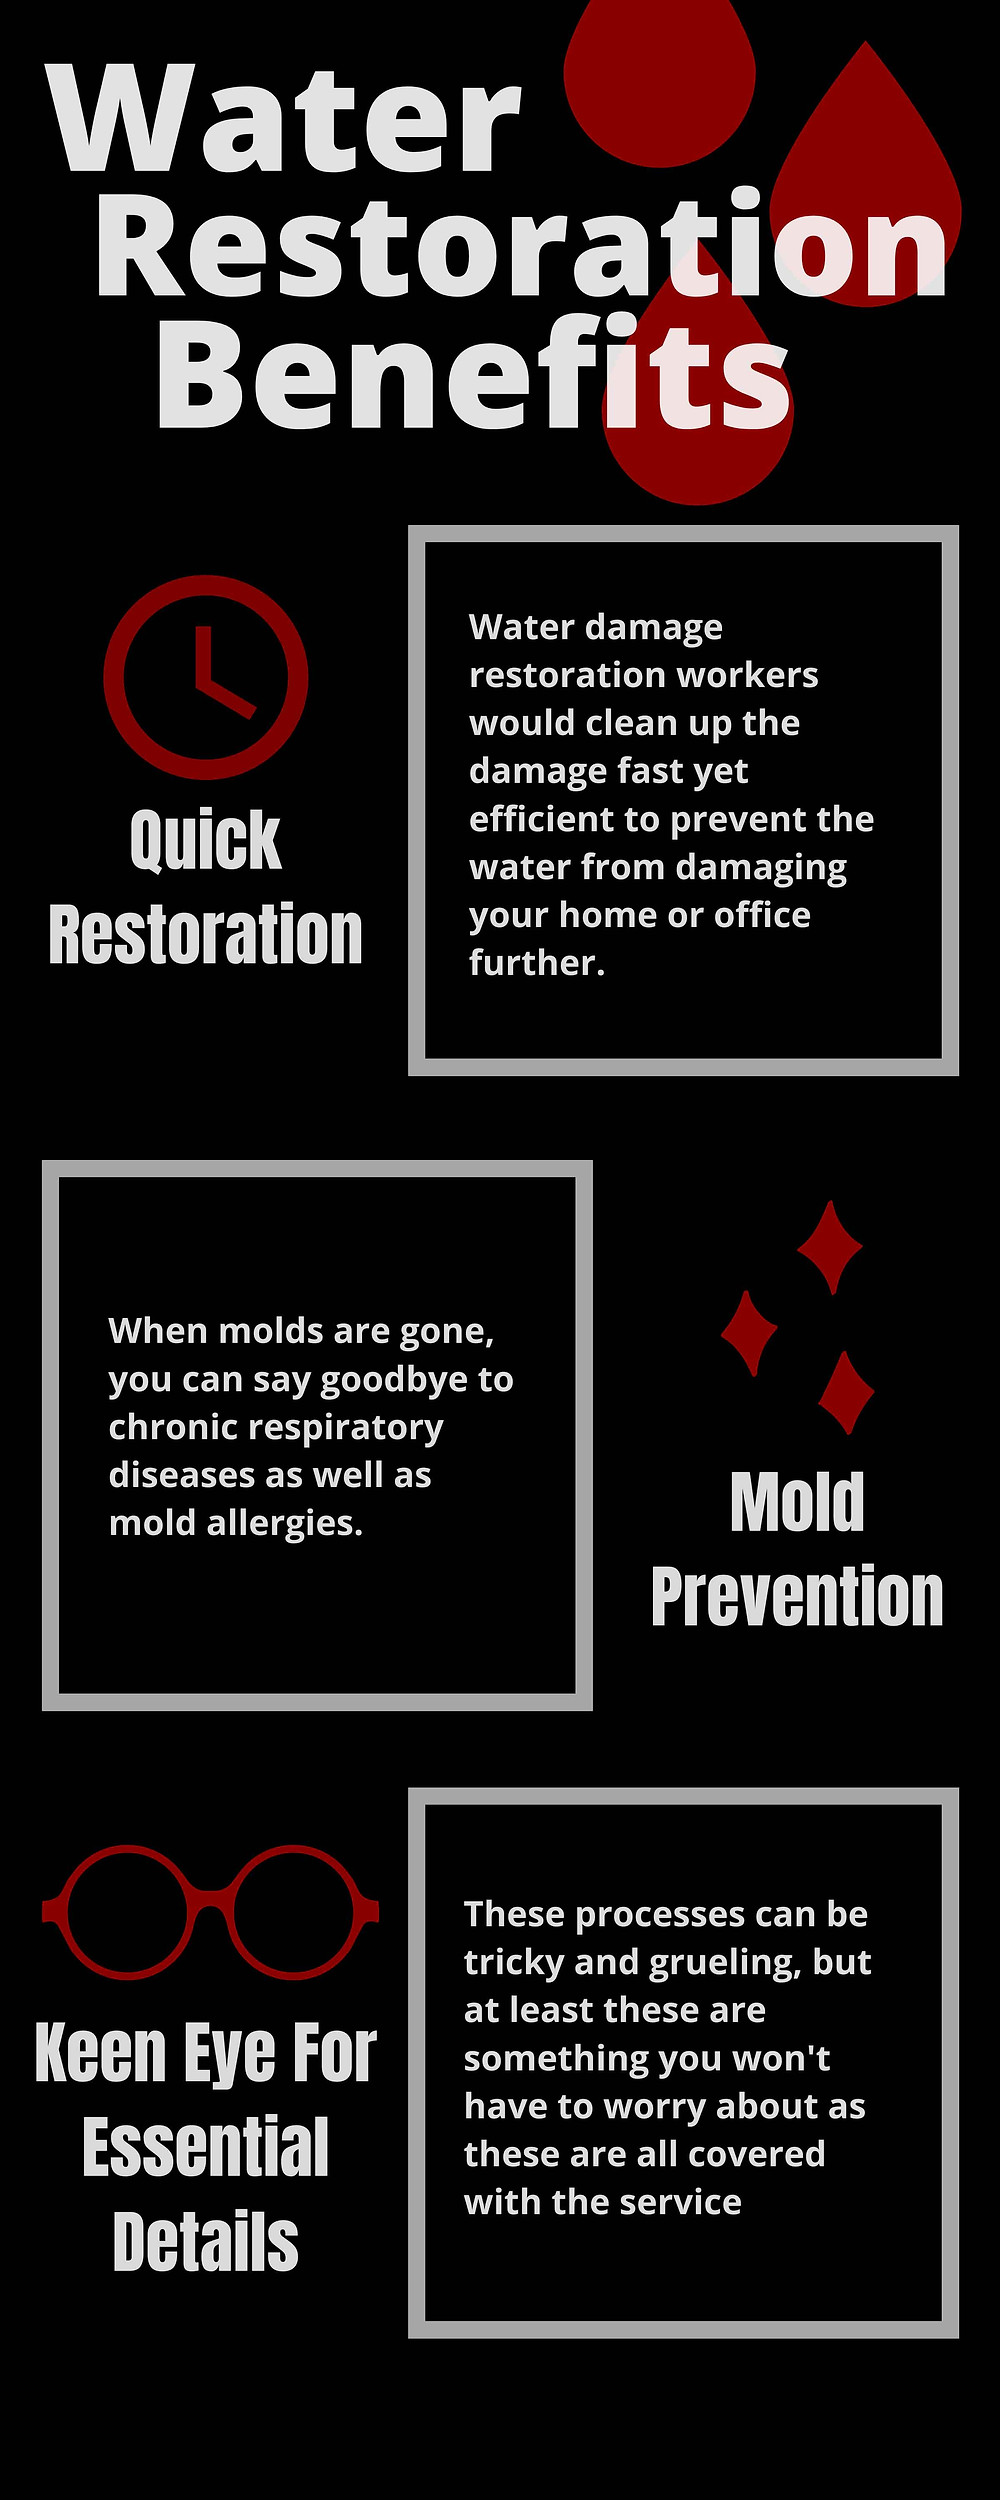 water-restoration-benefits-infographic